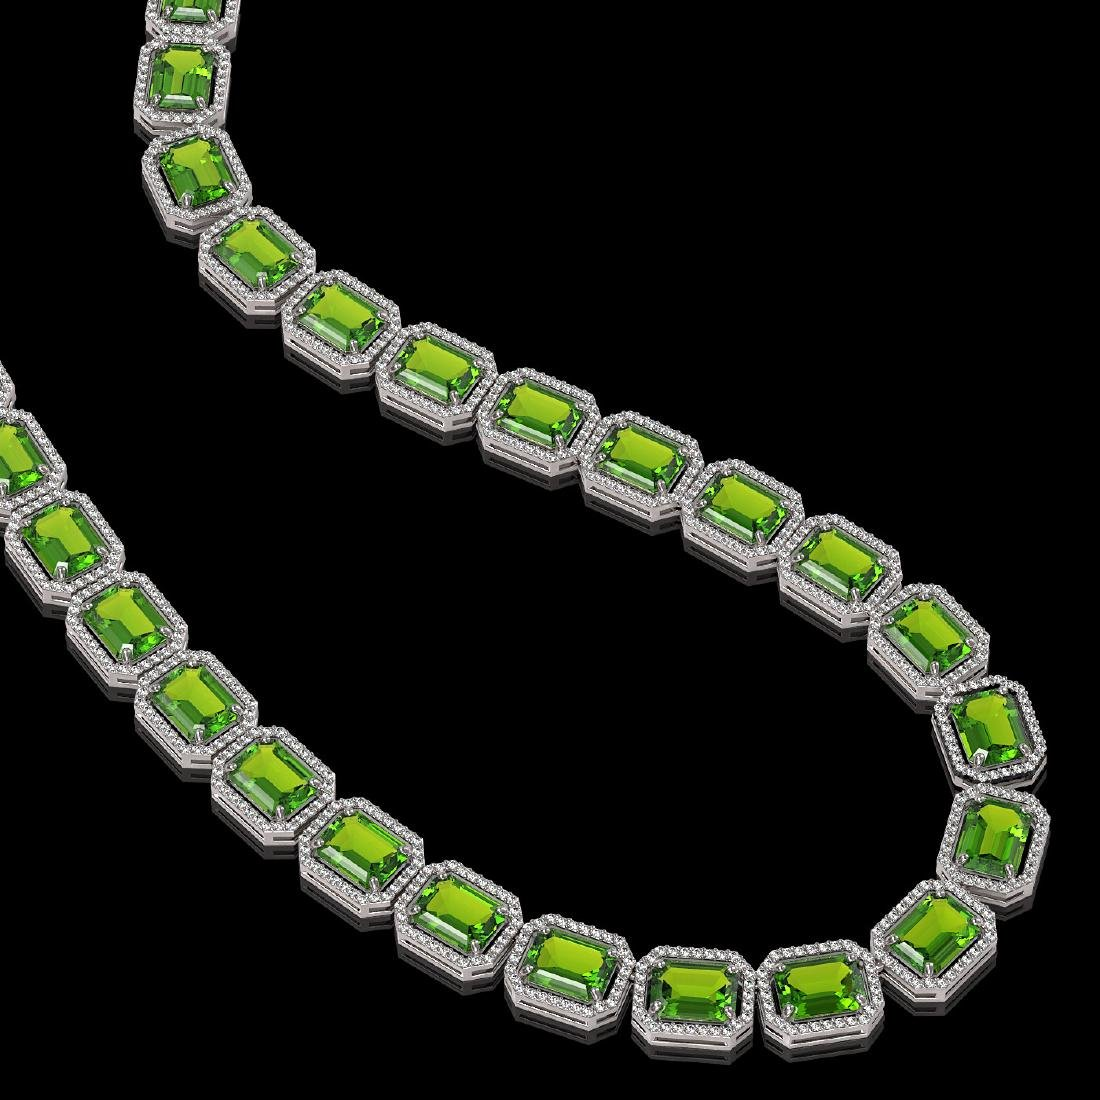 73.41 CTW Peridot & Diamond Halo Necklace 10K White - 2